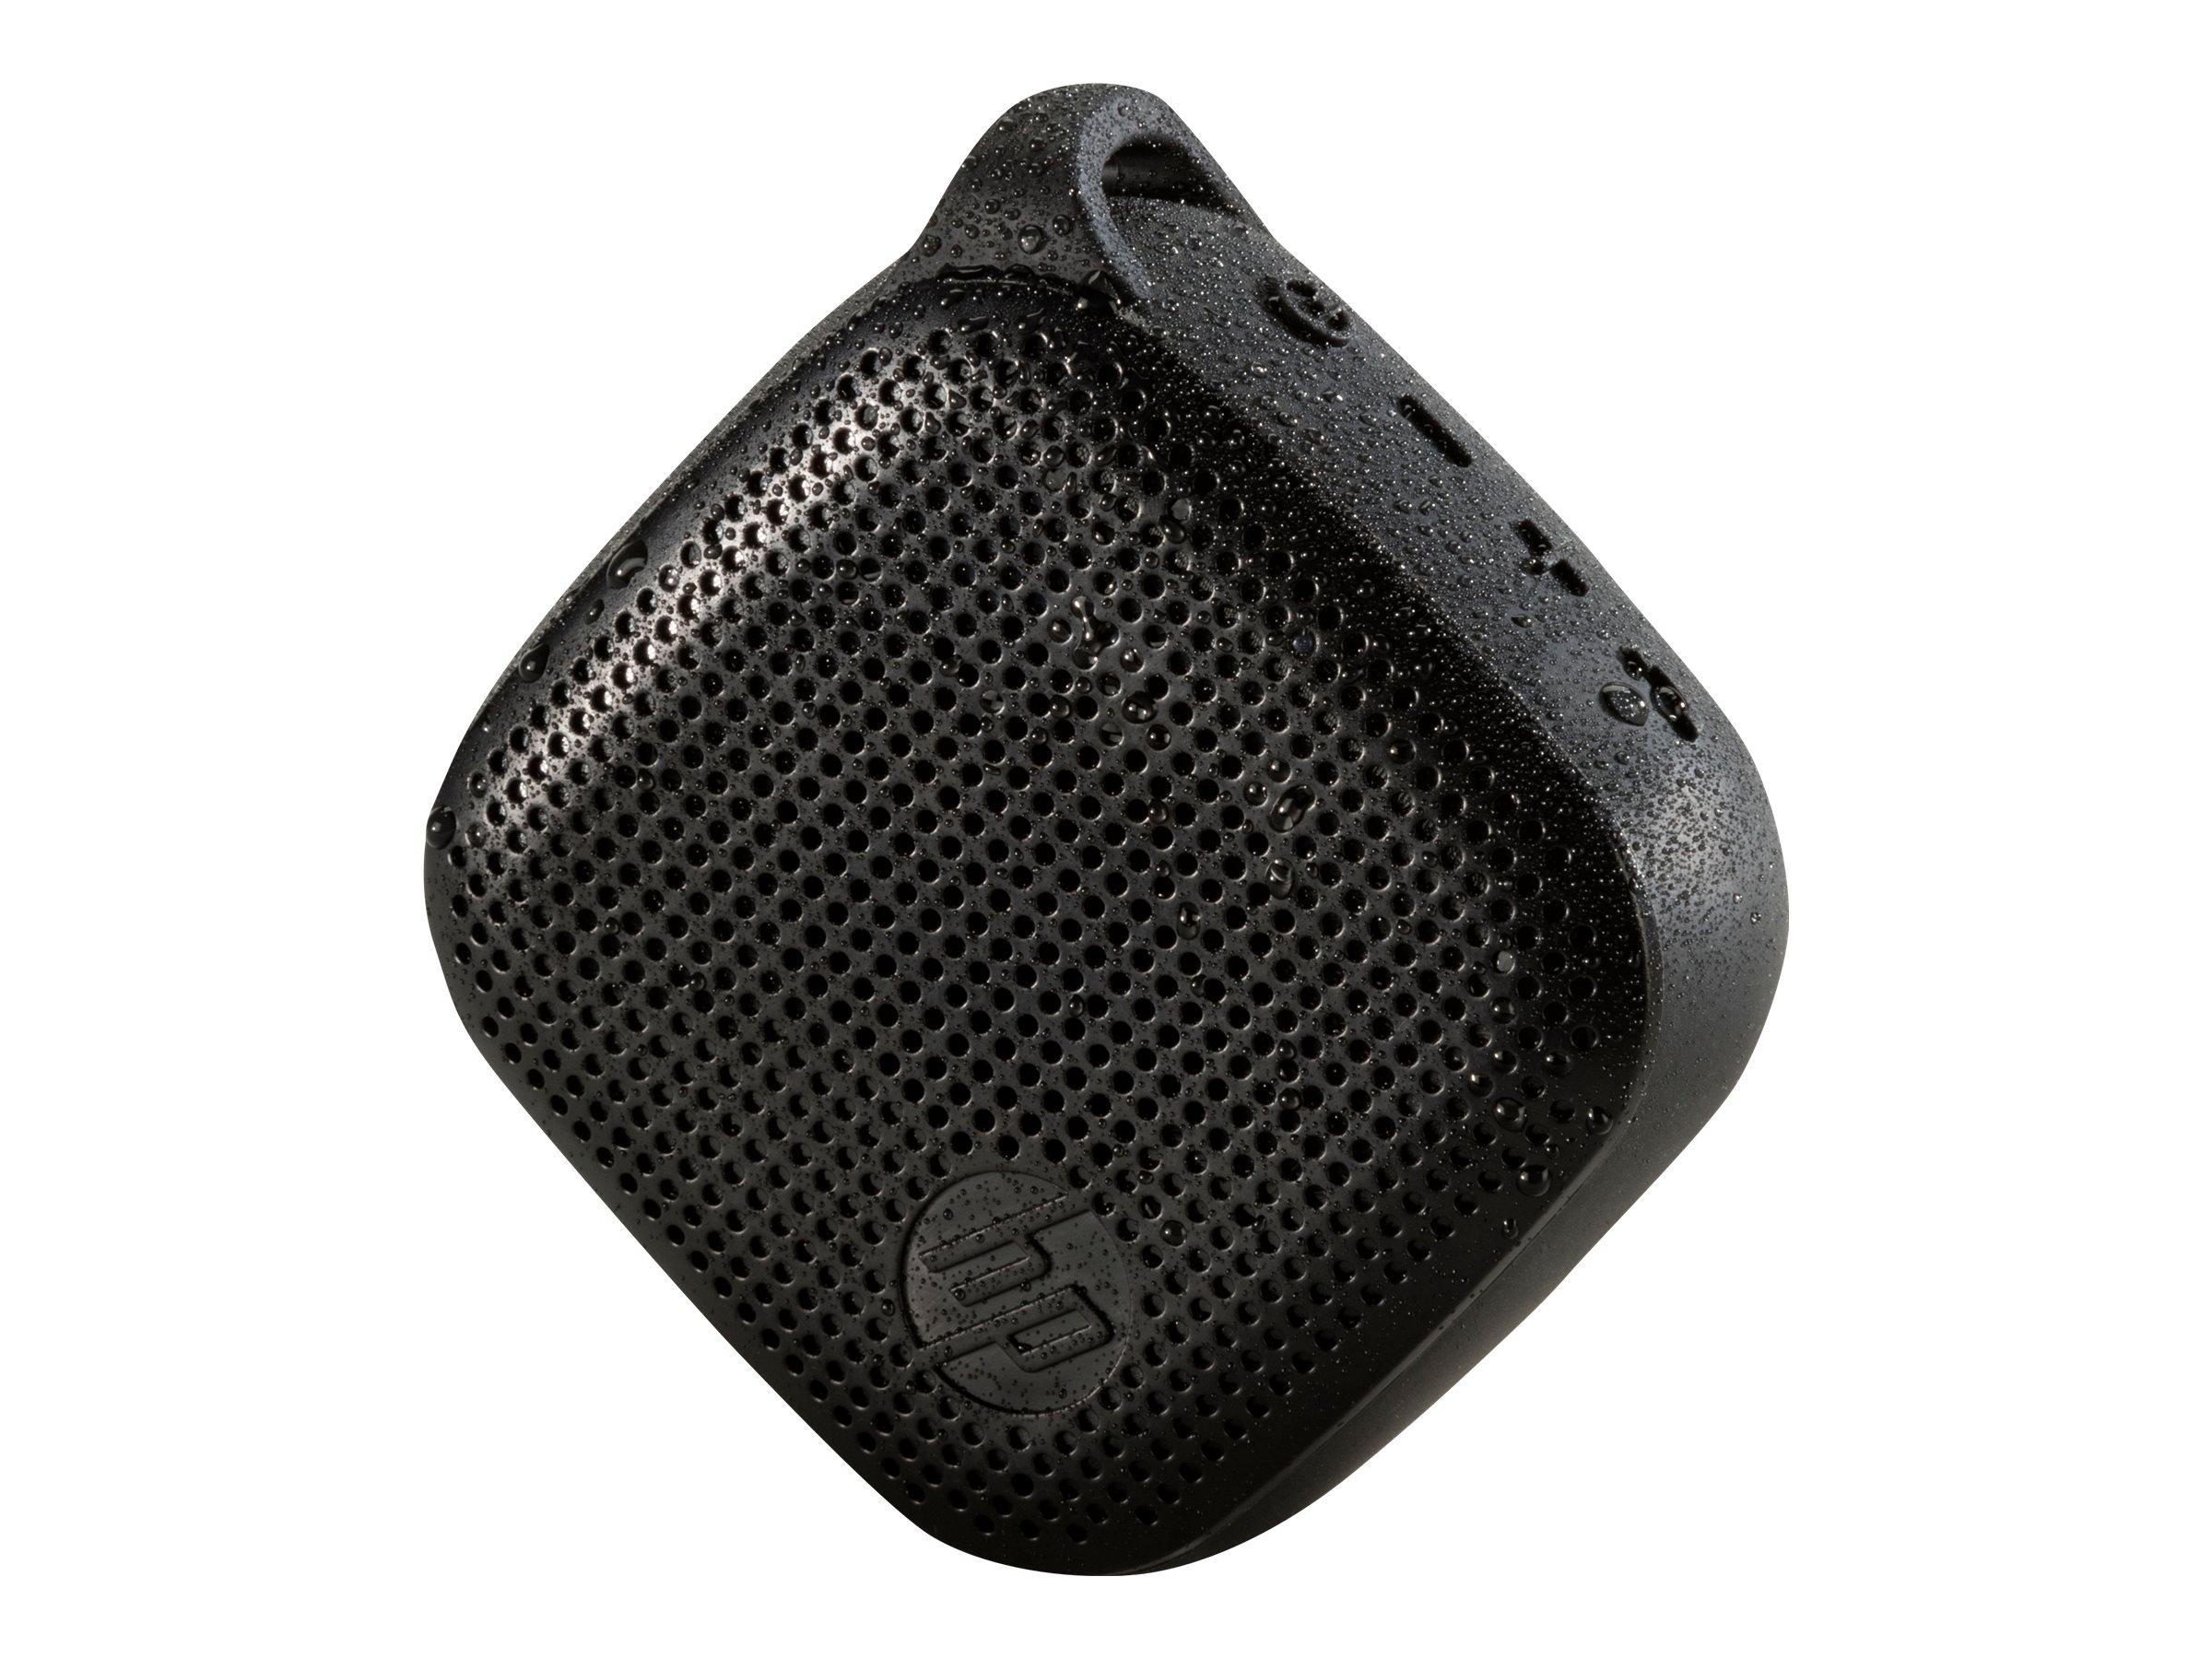 HP Mini 300 - Lautsprecher - tragbar - kabellos - Bluetooth - für OMEN by HP 17; OMEN X by HP 15; HP 14; ENVY x360; Pavilion 15;